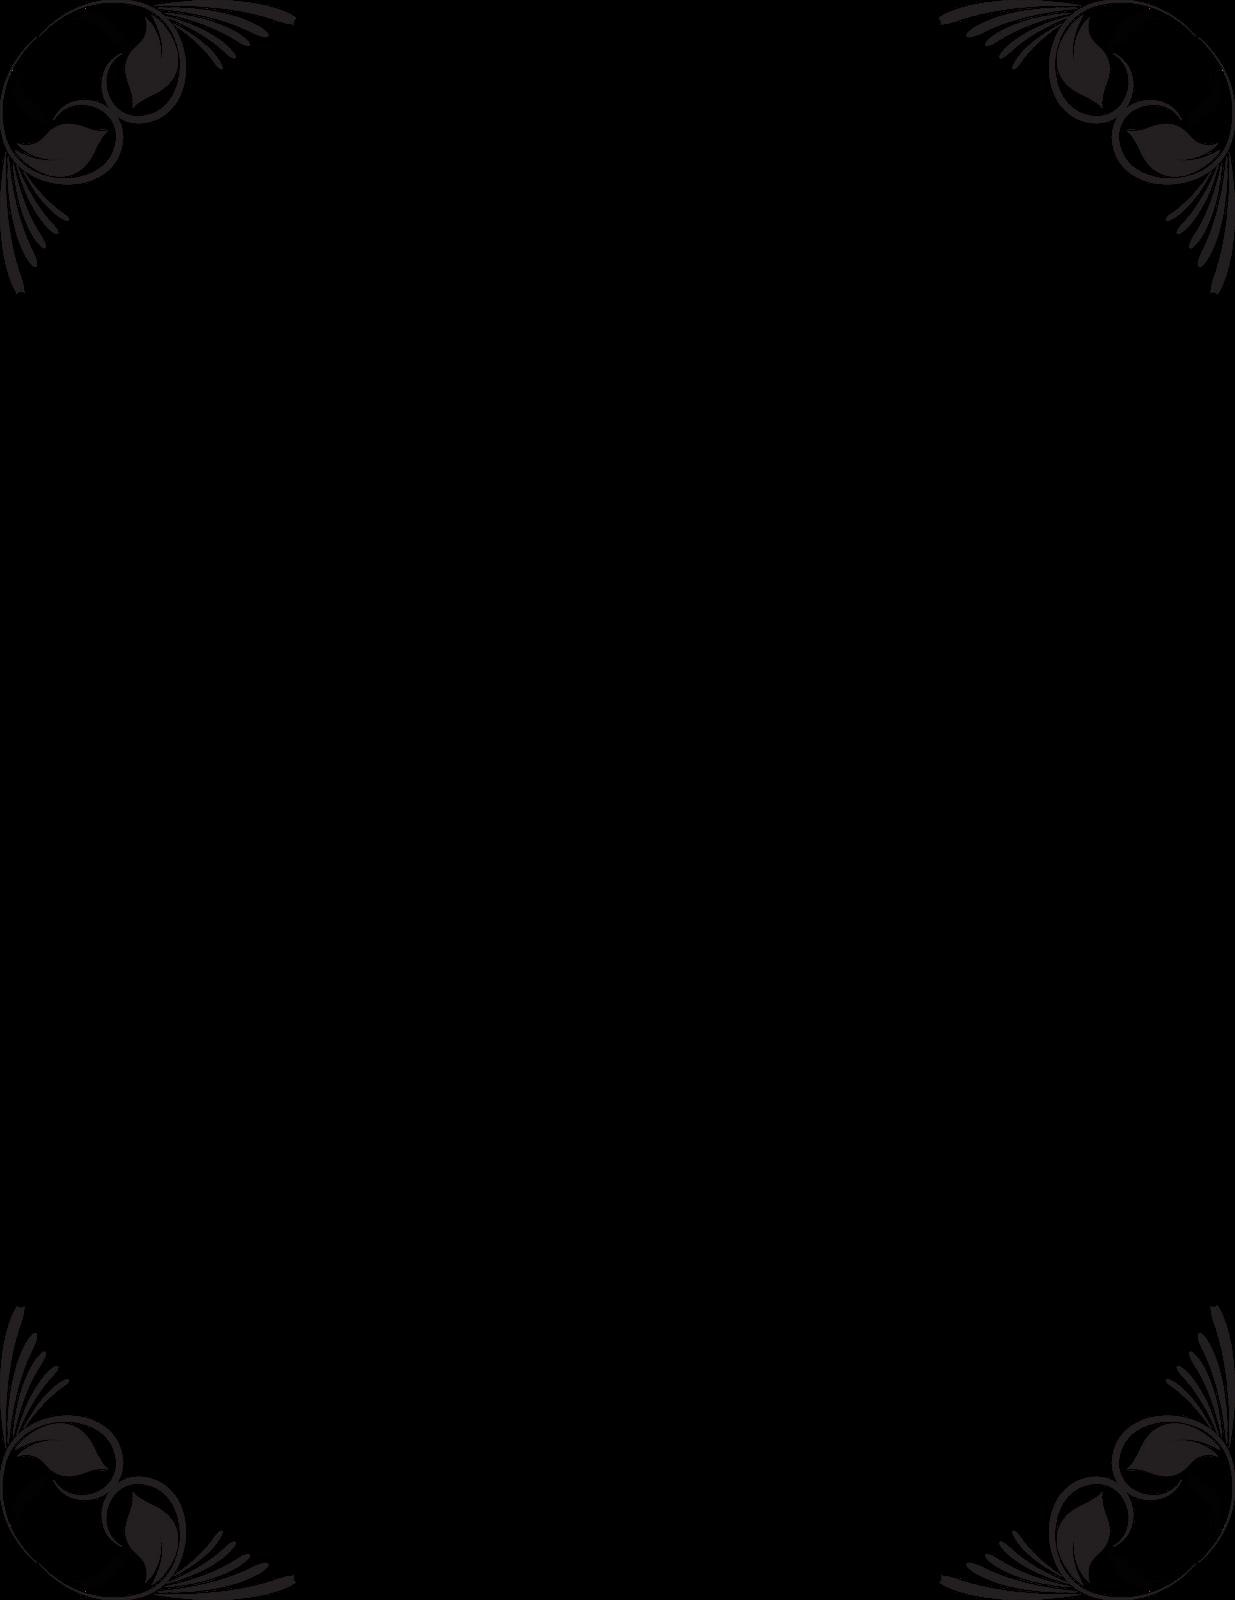 Free Coreldraw Tutorials Vector Design